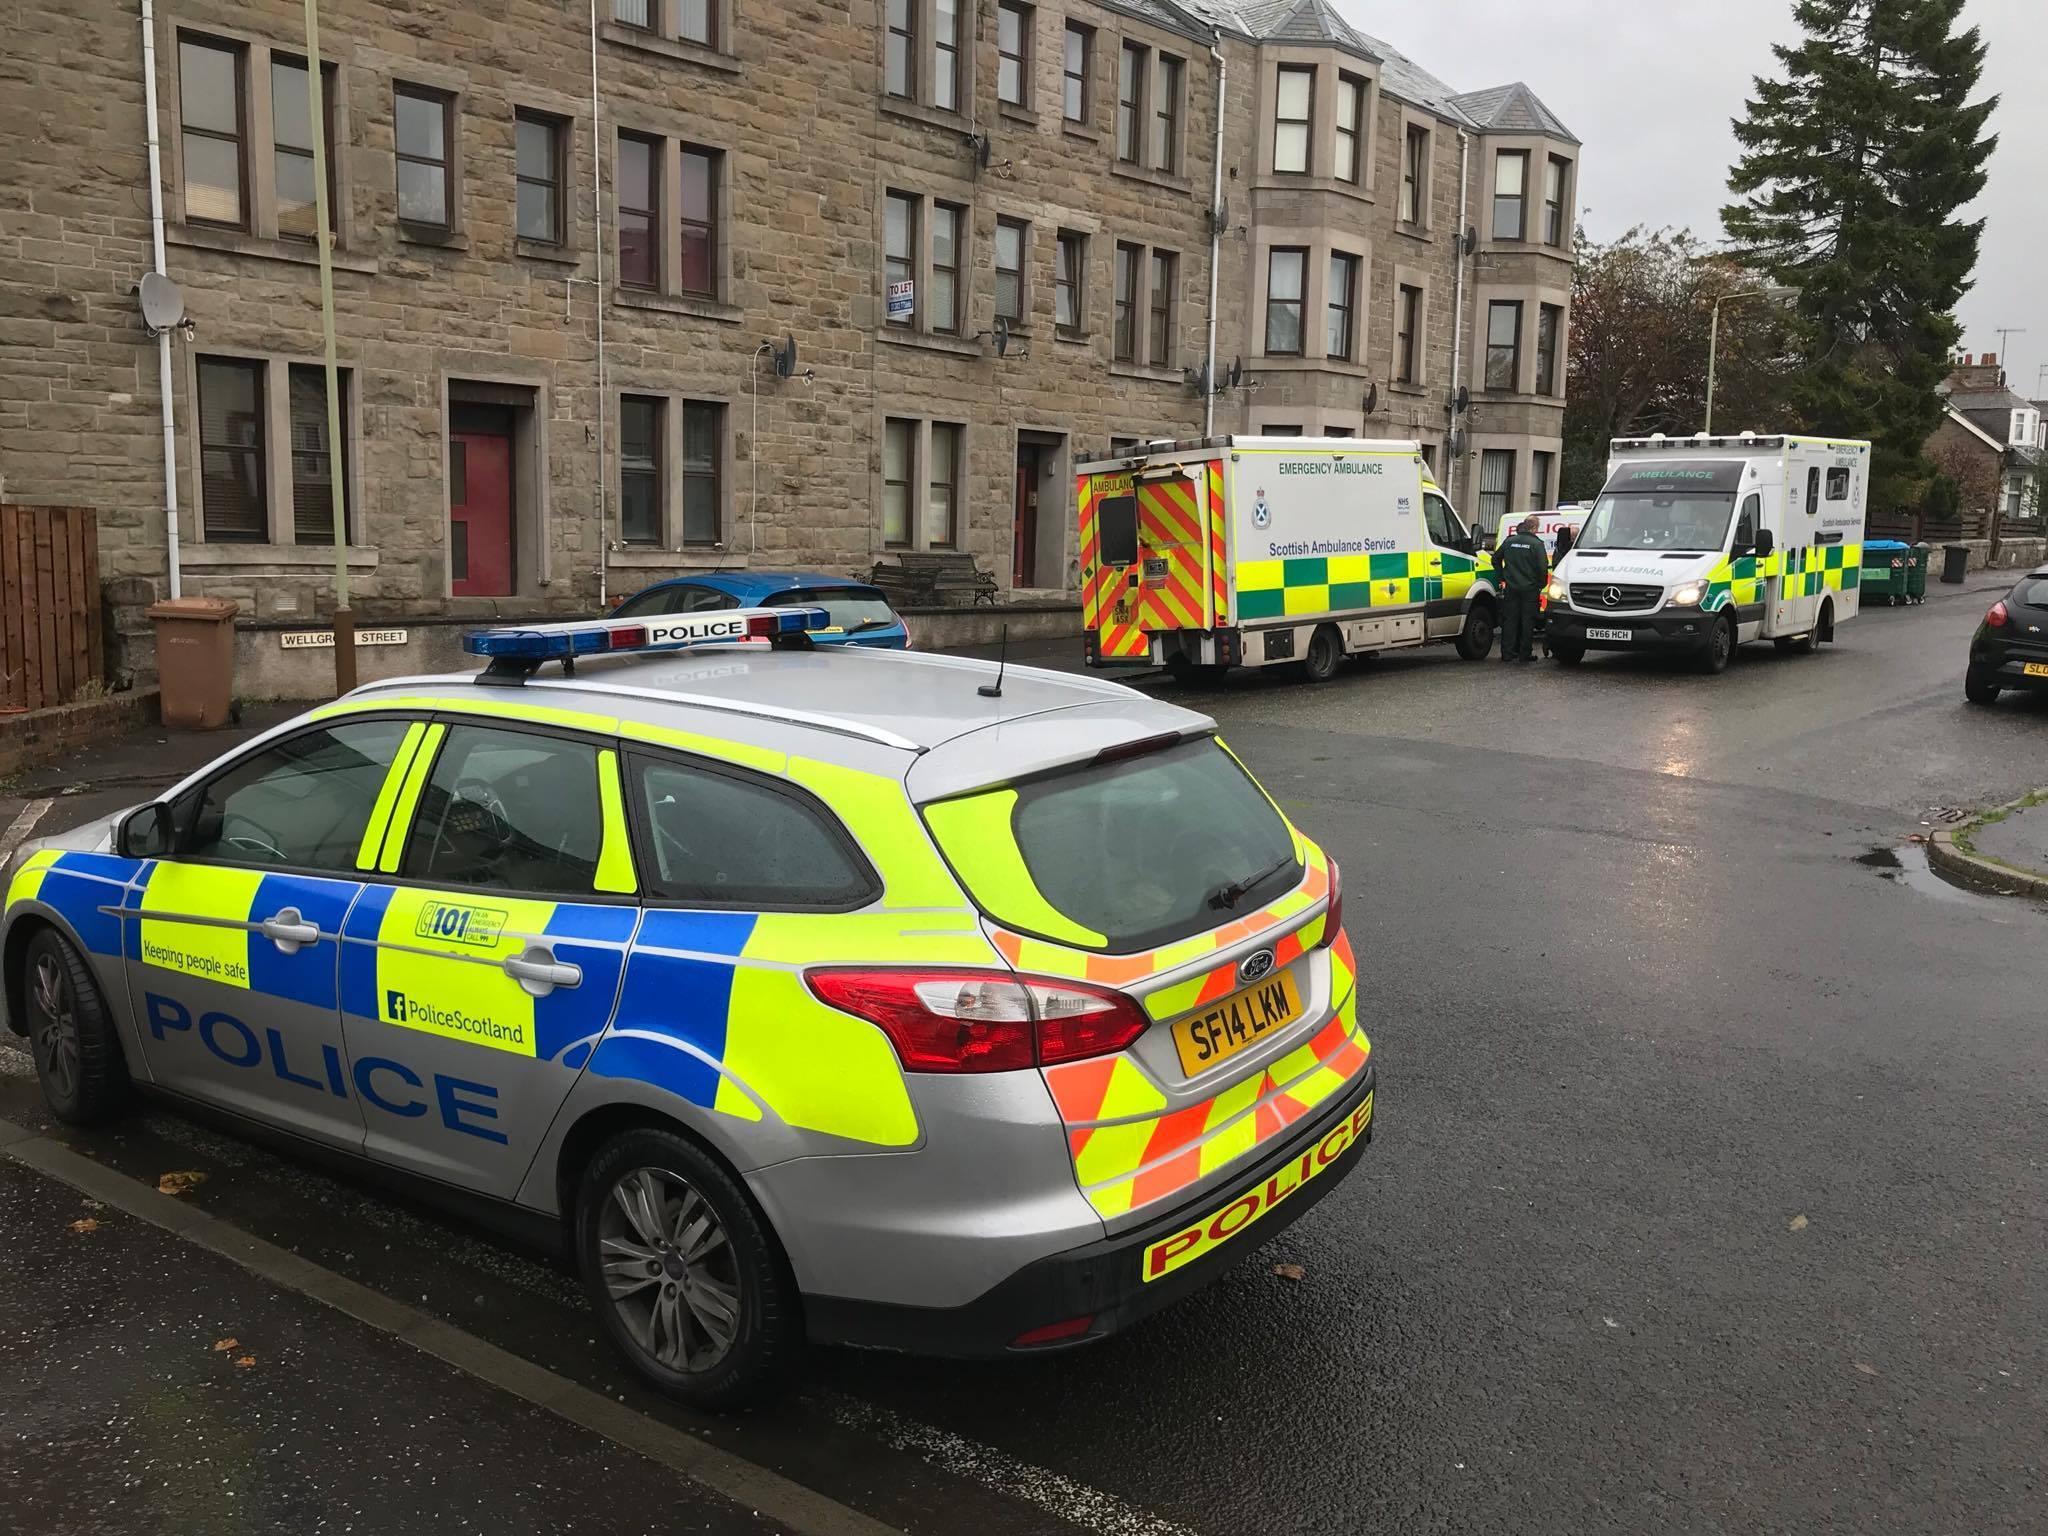 Police at the scene in Lochee.